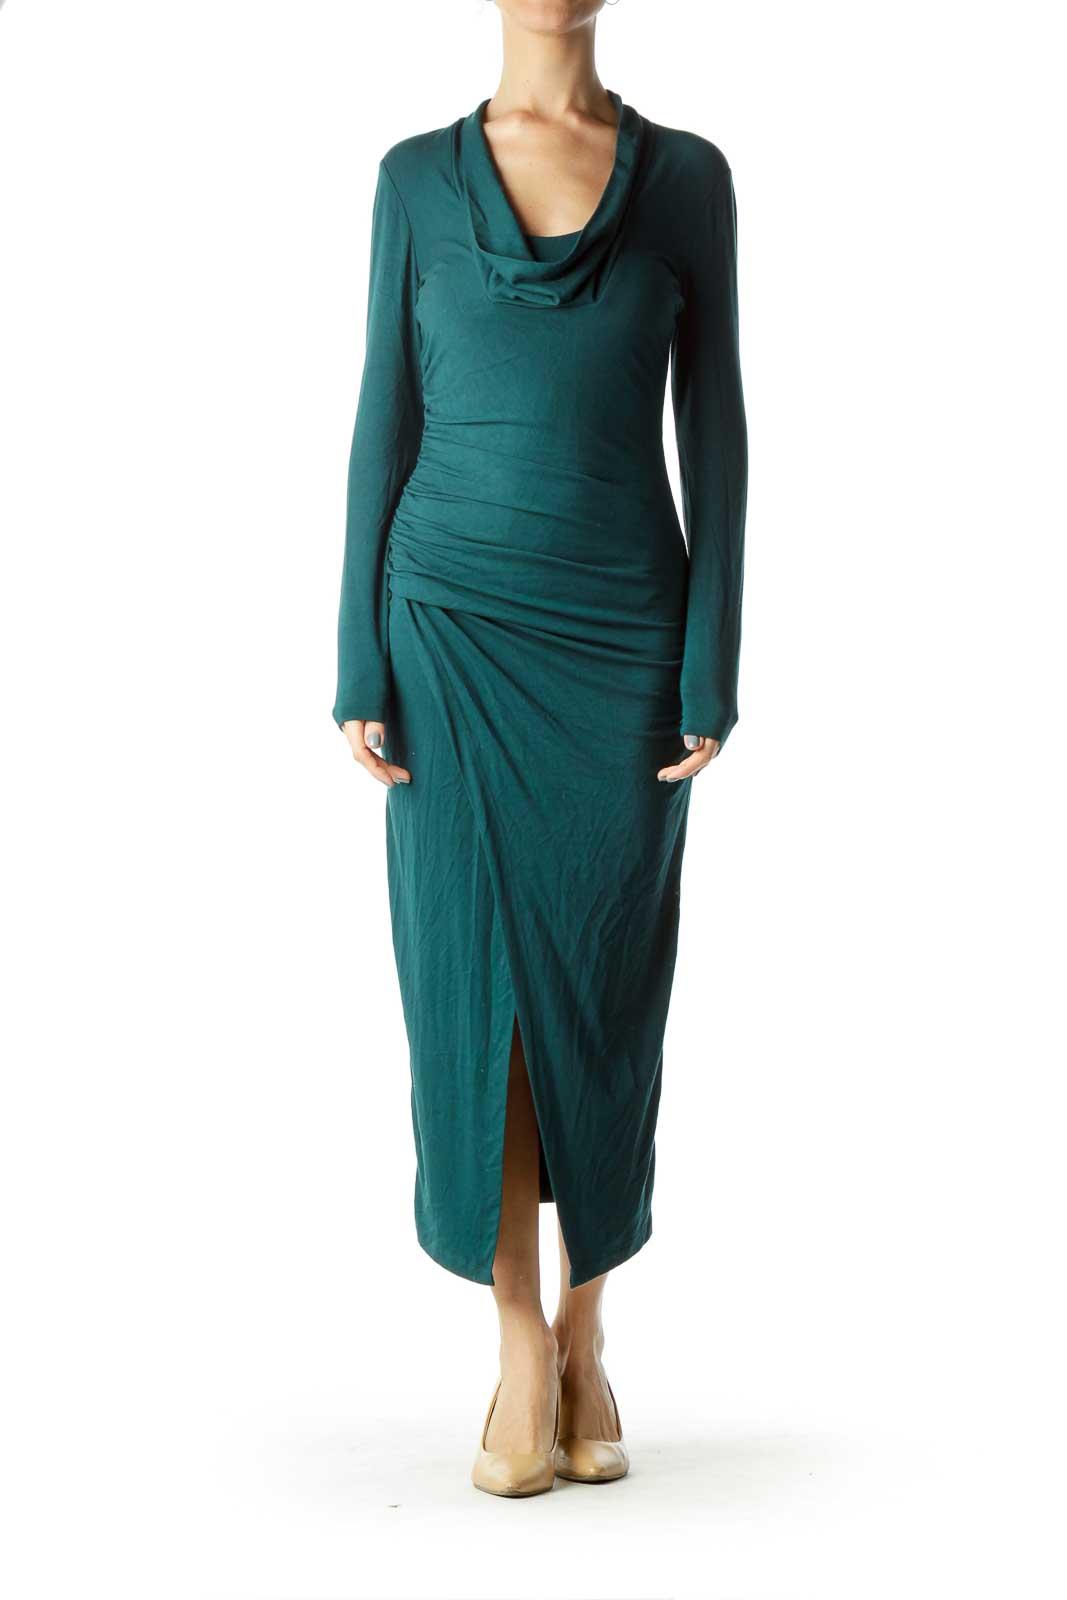 Dark Green Cowl Neck Fitted Jersey Dress